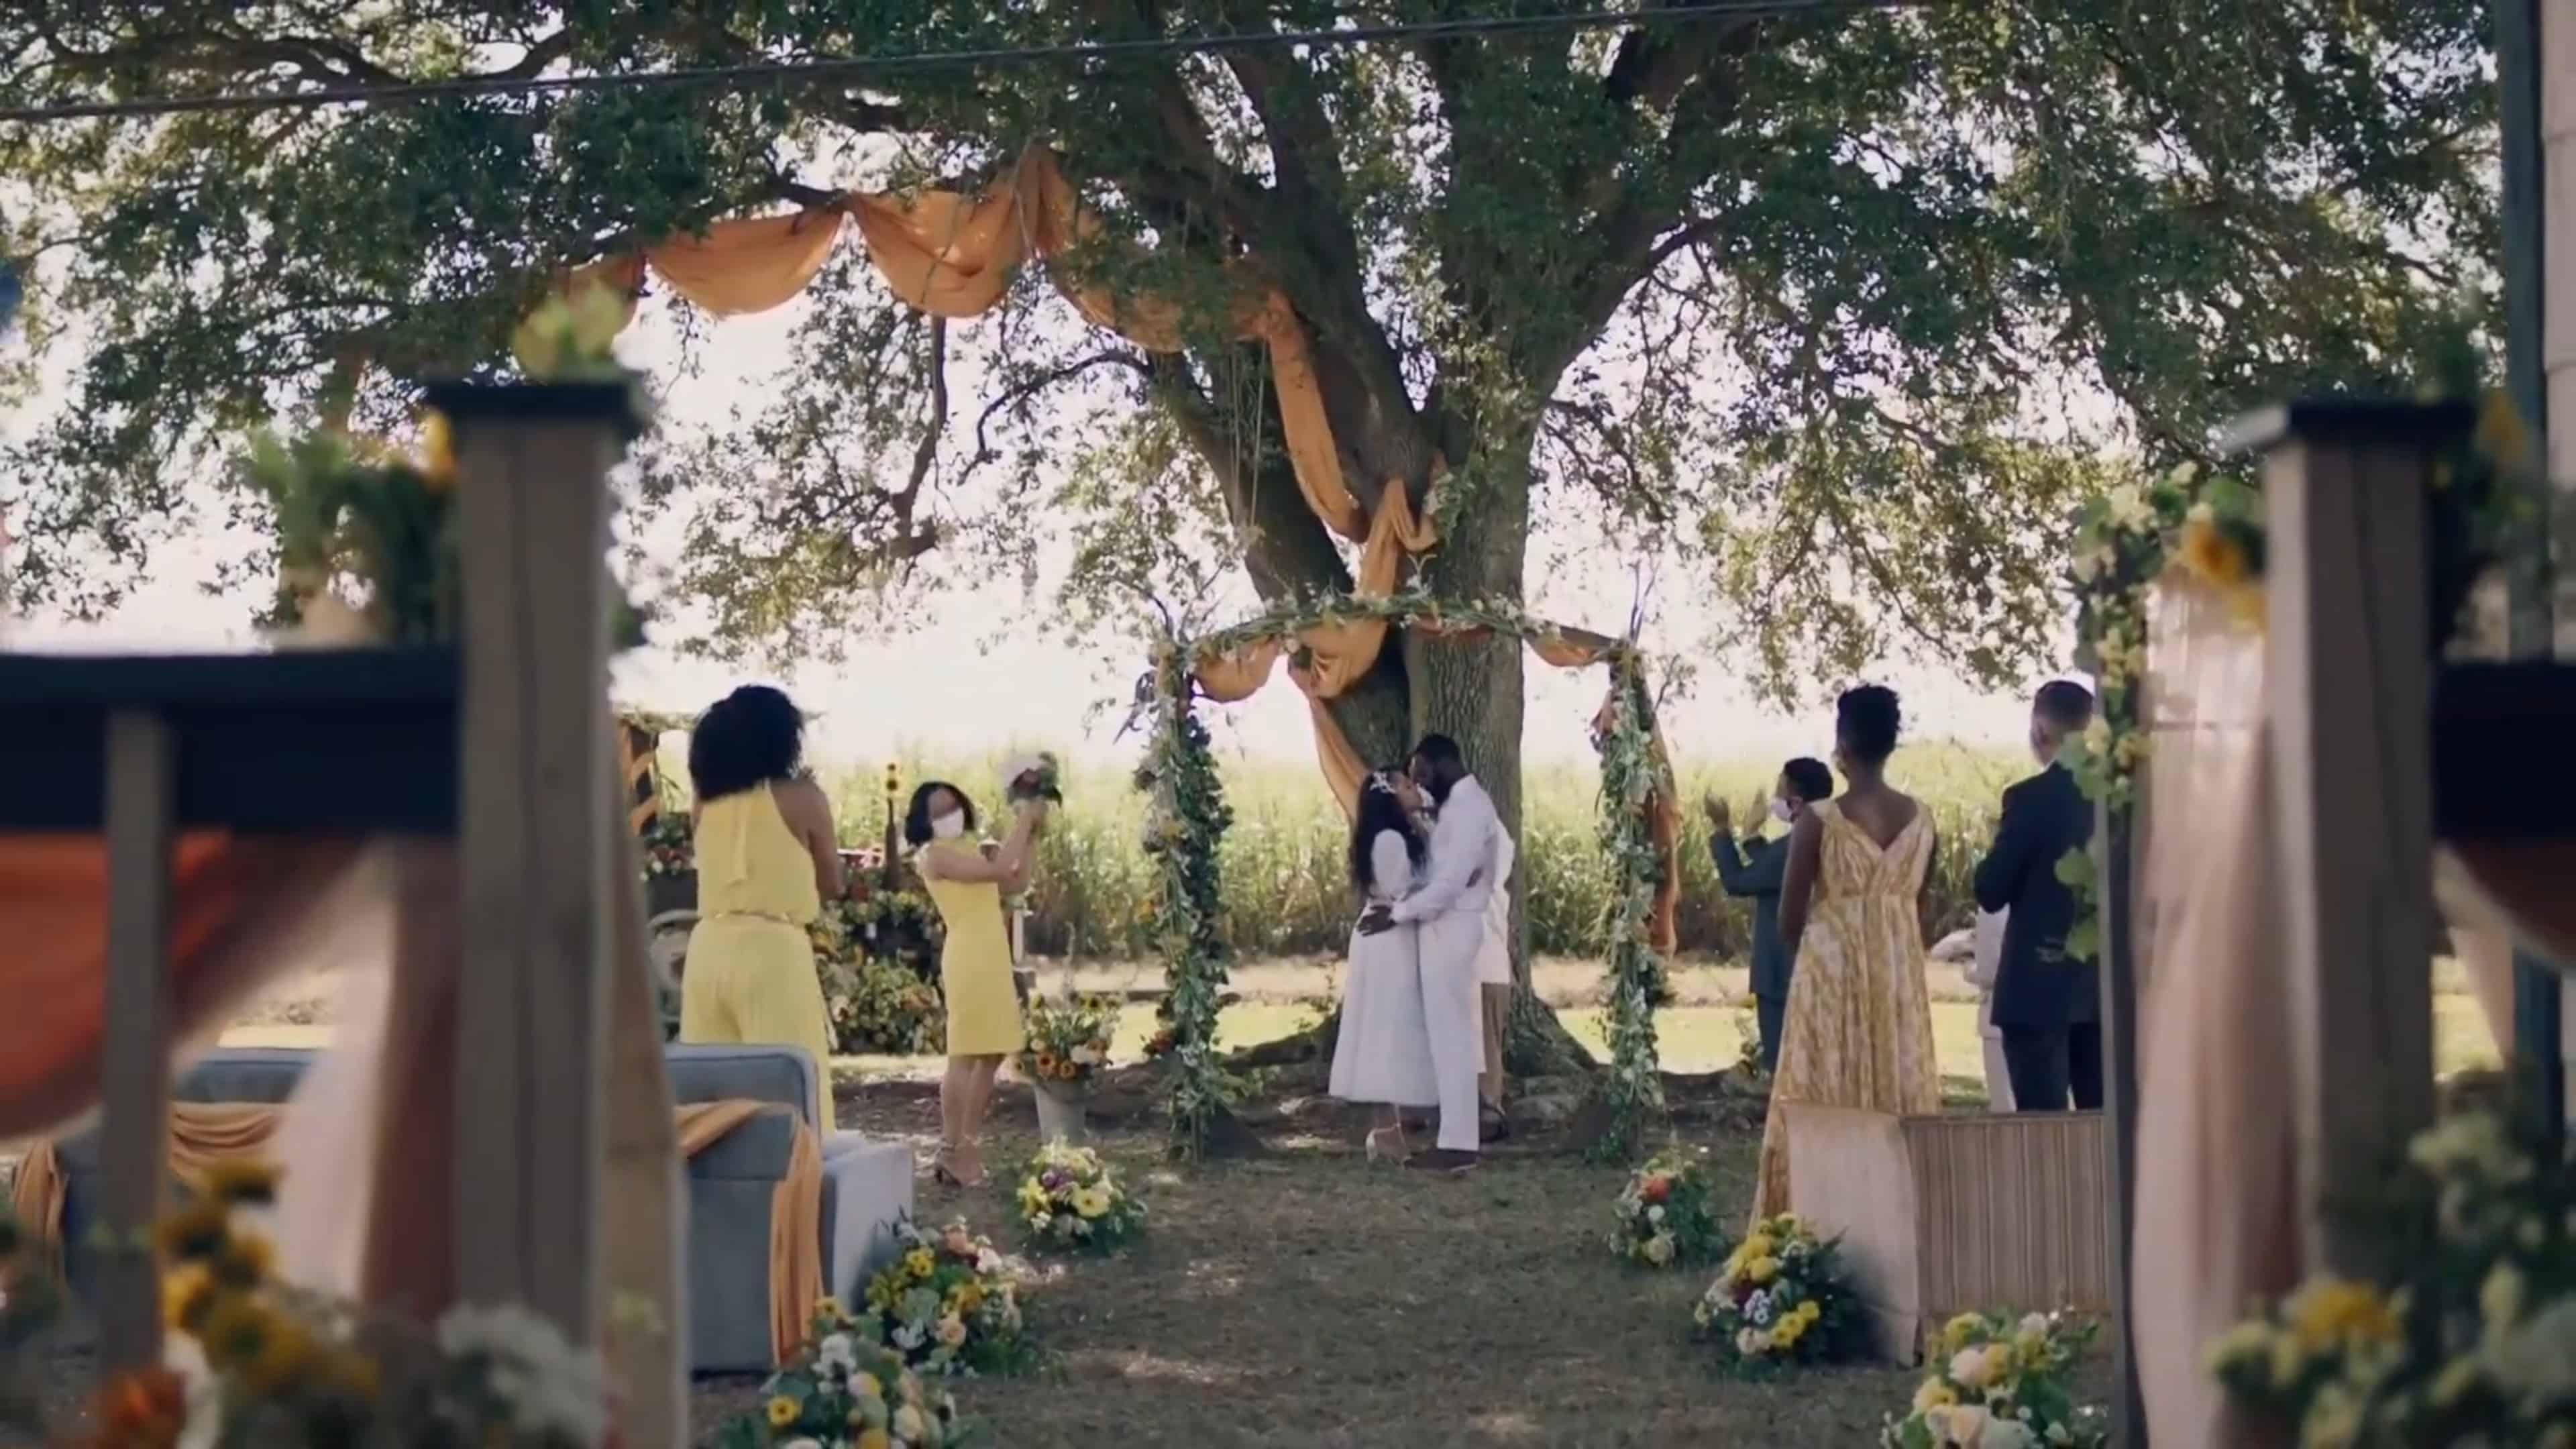 Ralph Angel and Darla's wedding